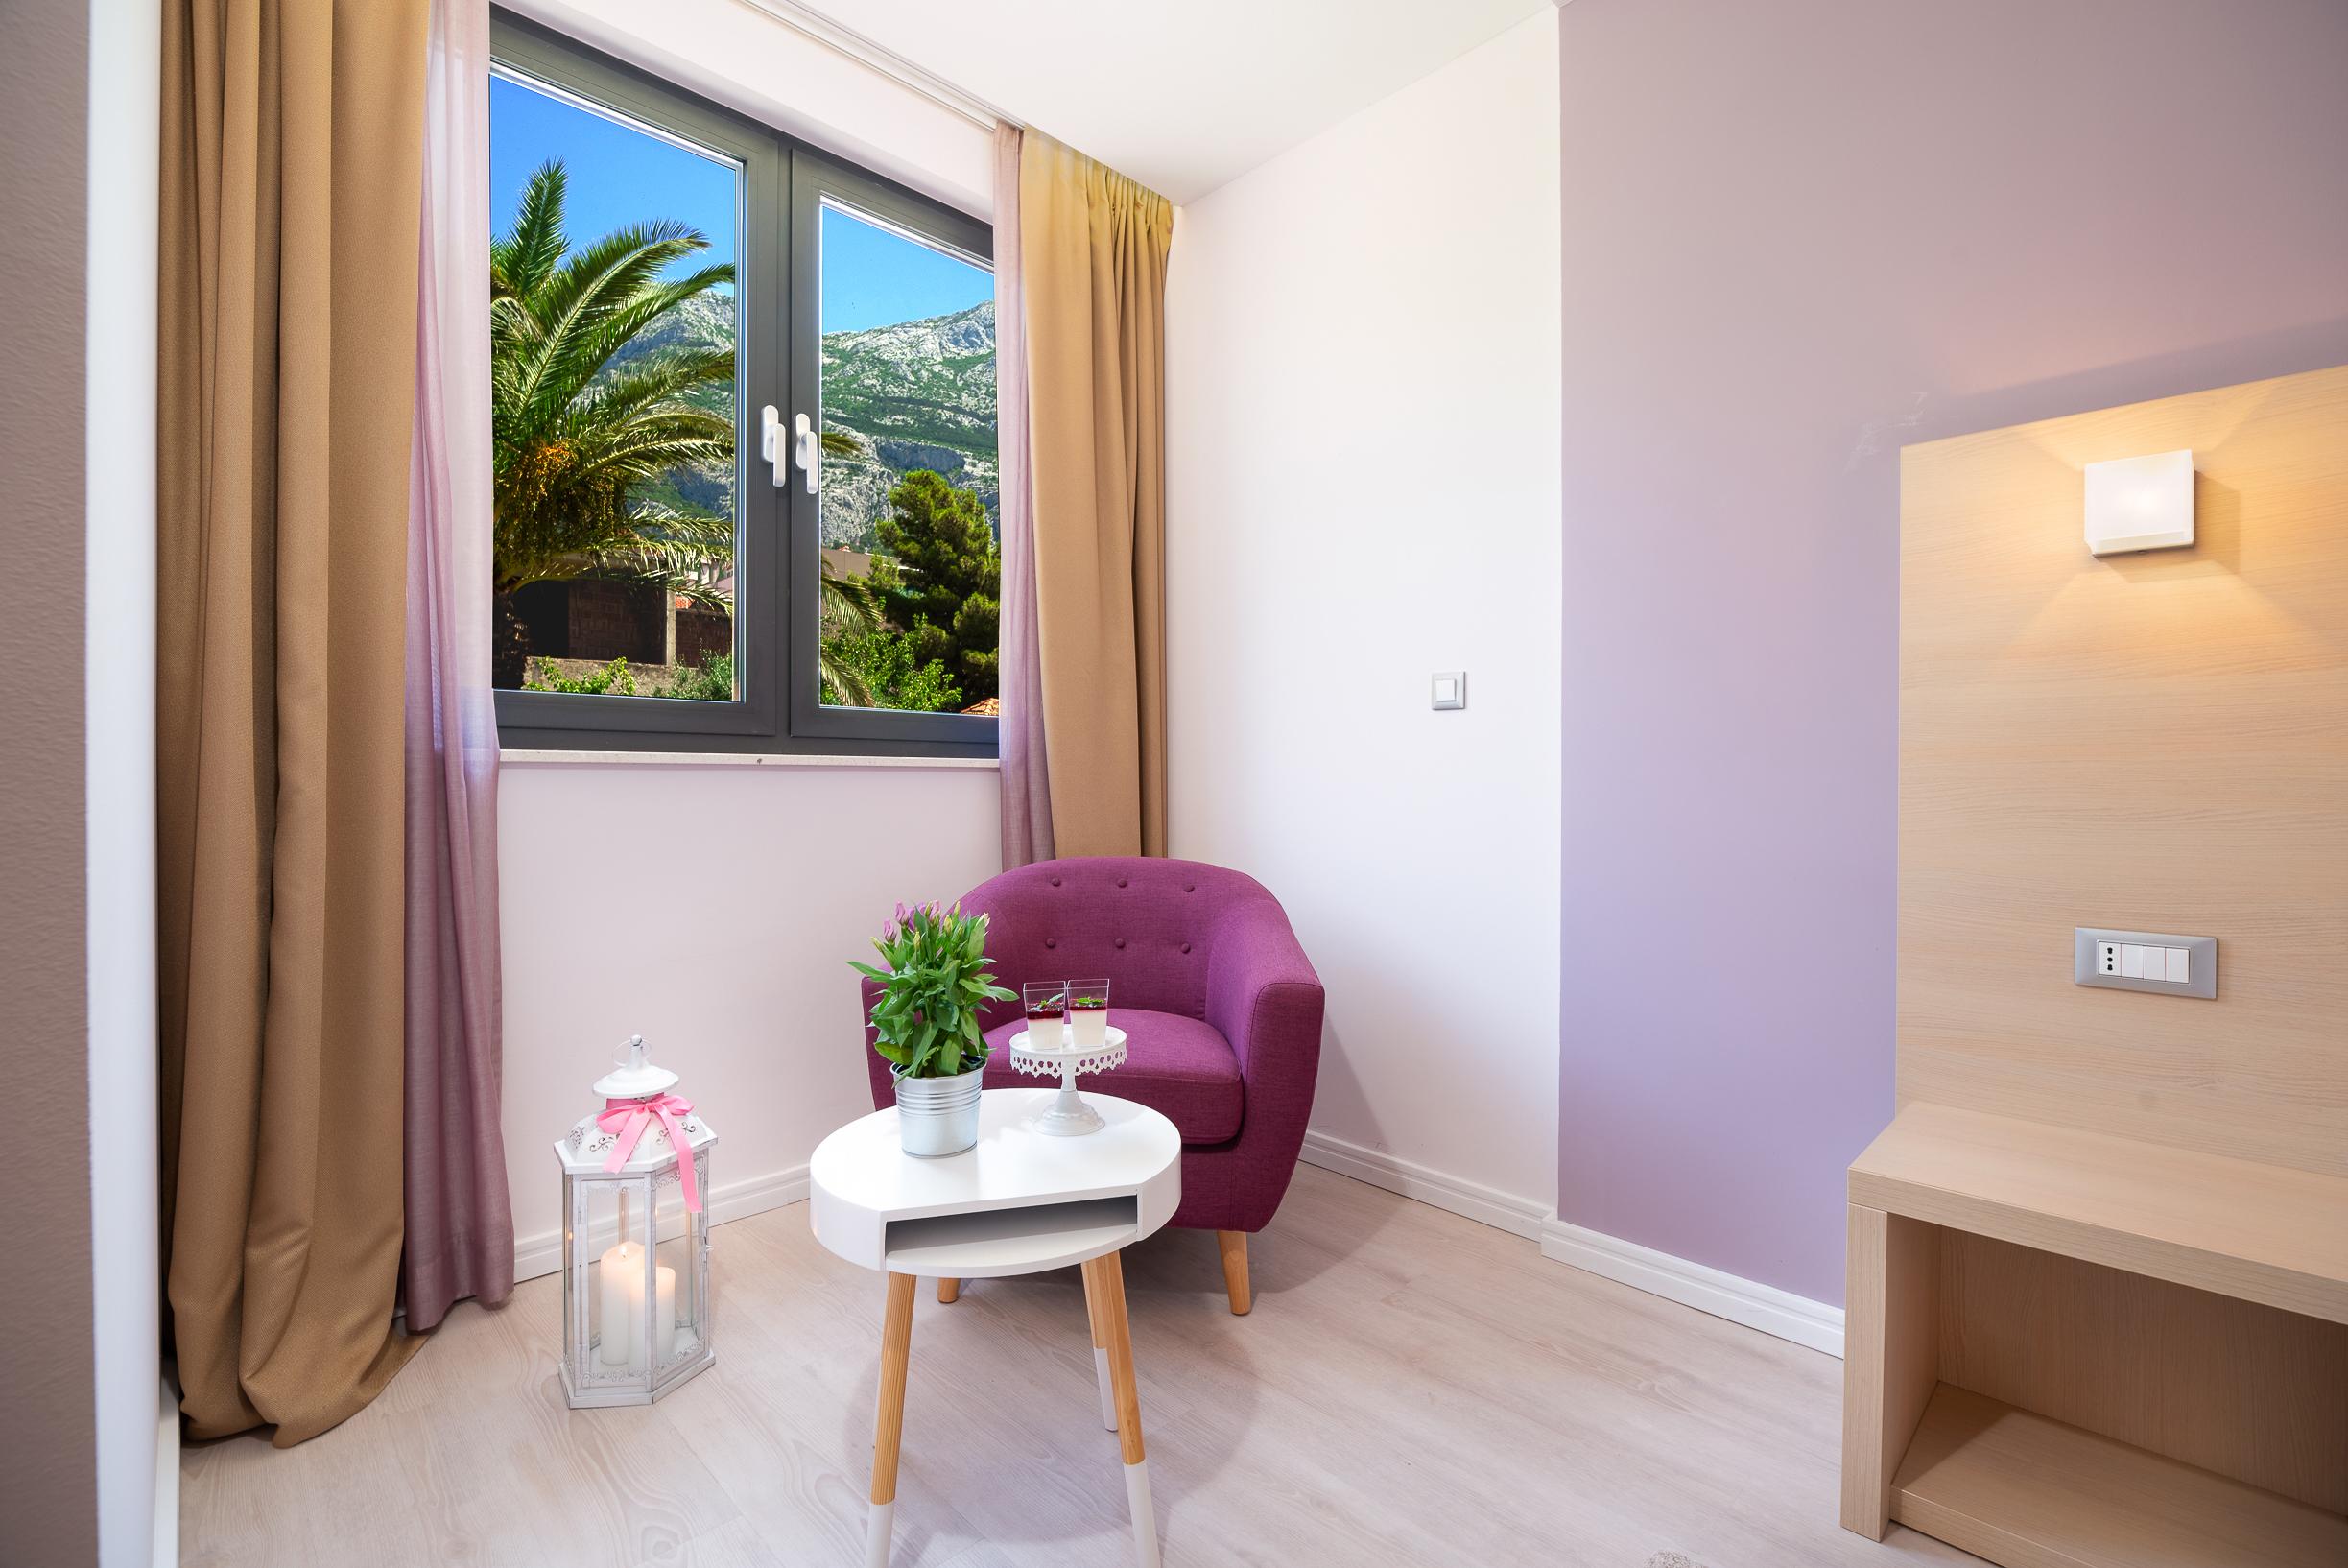 Hotel-Maritimo-Soba-5-3-of-21